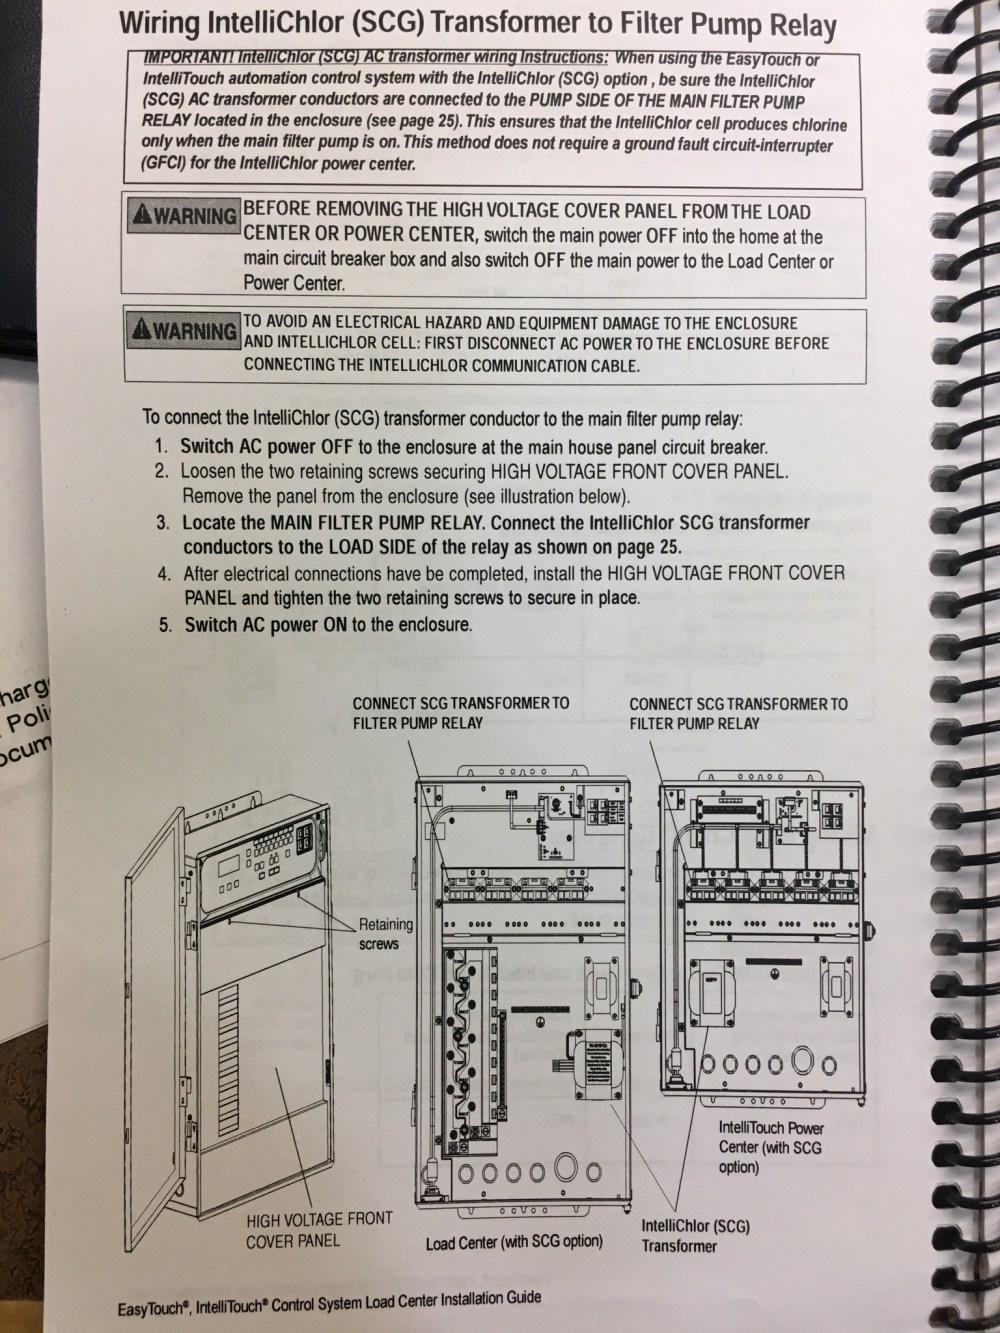 medium resolution of intellitouch wiring diagrams wiring diagram dat intellitouch wiring diagram intellitouch wiring diagrams